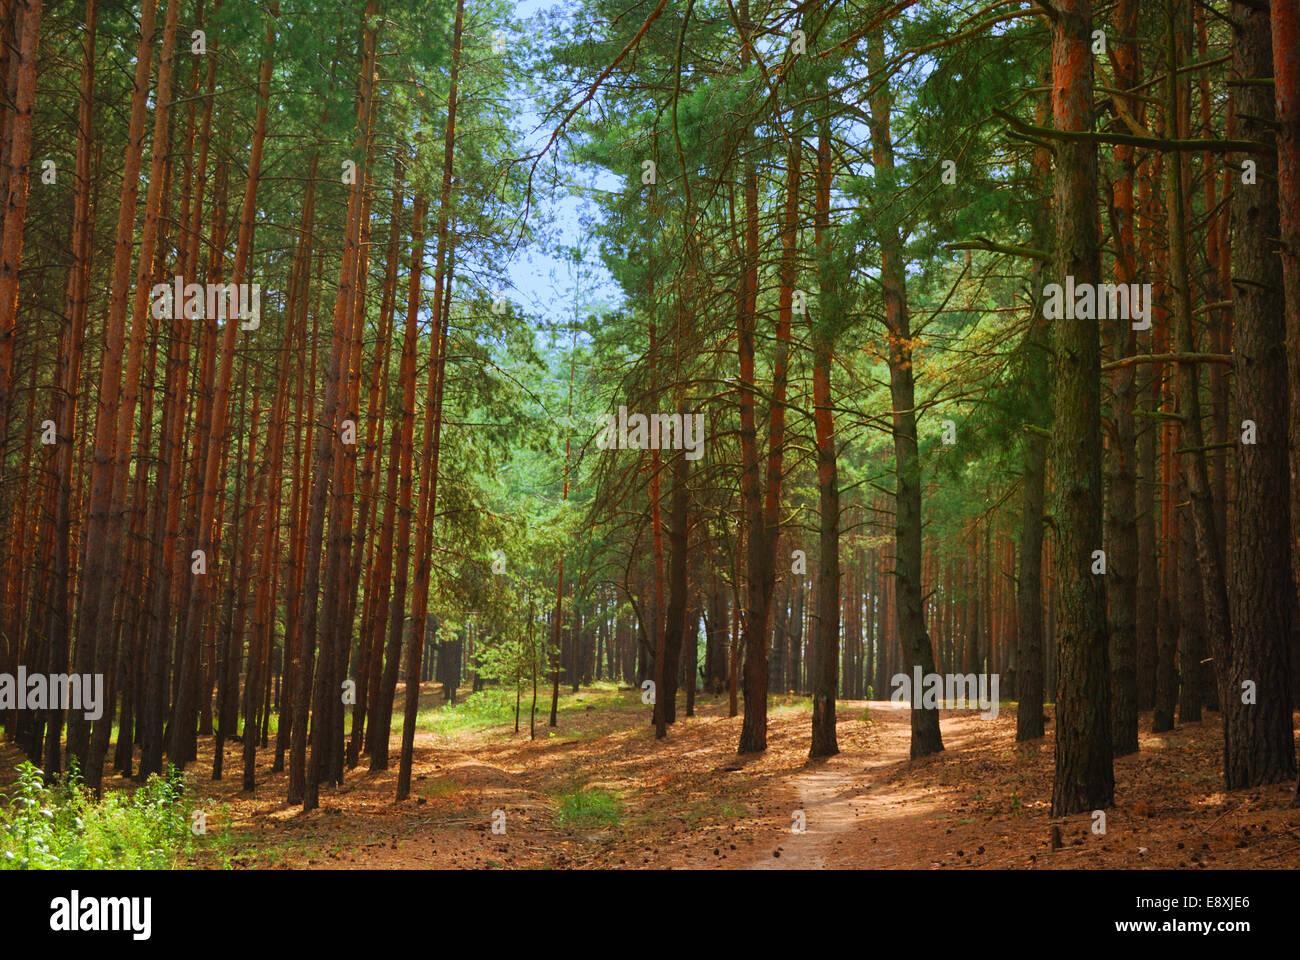 Sun Winding Path Stock Photos & Sun Winding Path Stock Images - Alamy